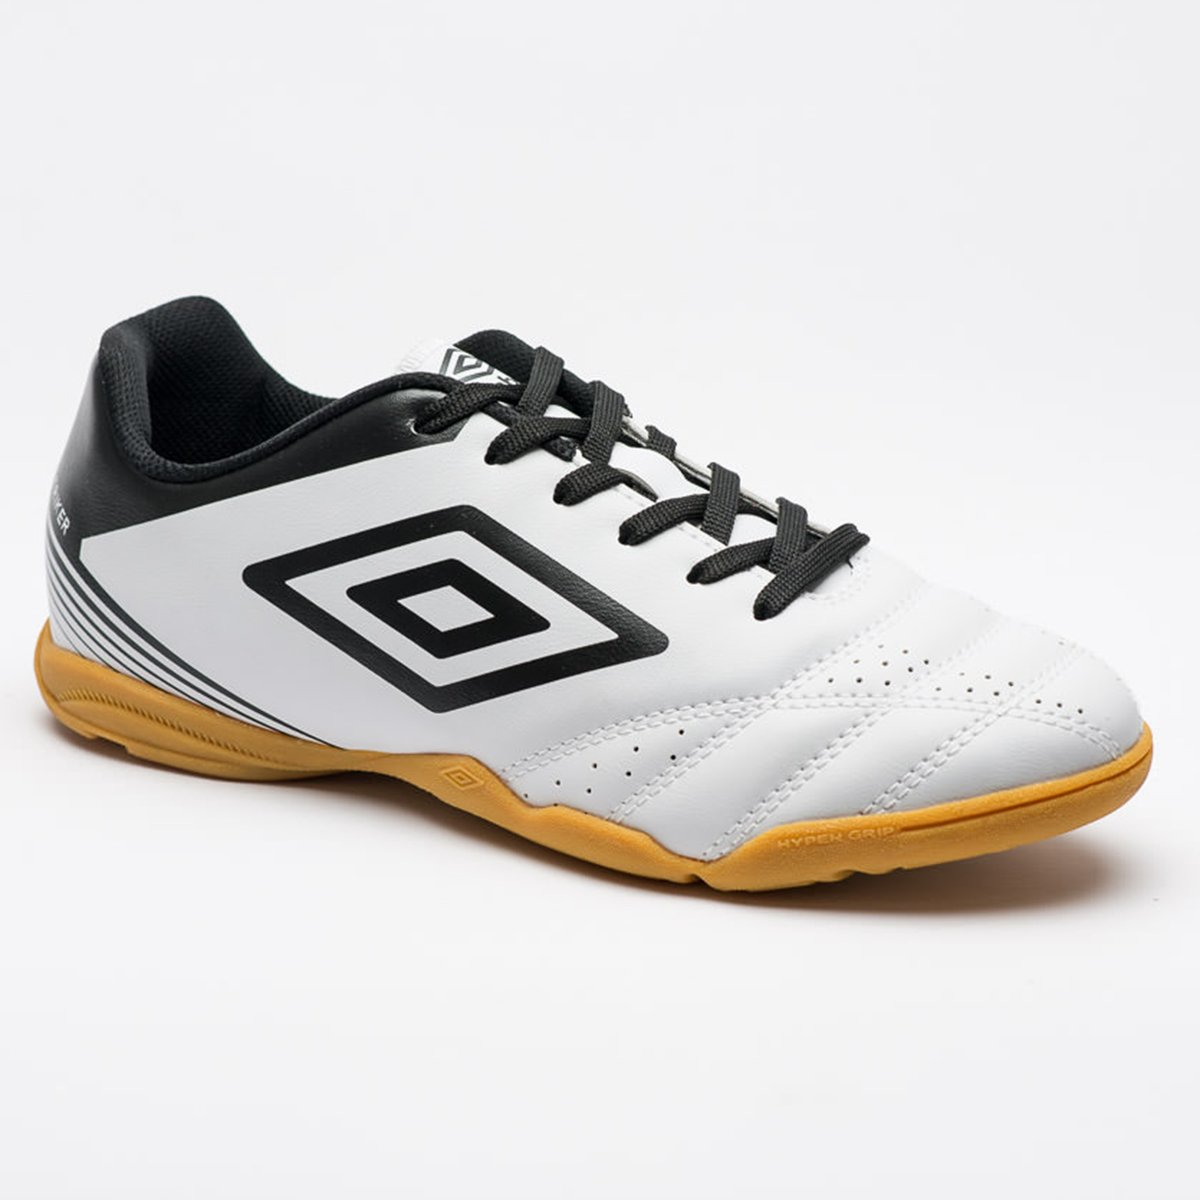 Chuteira Futsal Umbro Striker IV Masculina - Branco e Preto - Compre ... 2465558a448b1